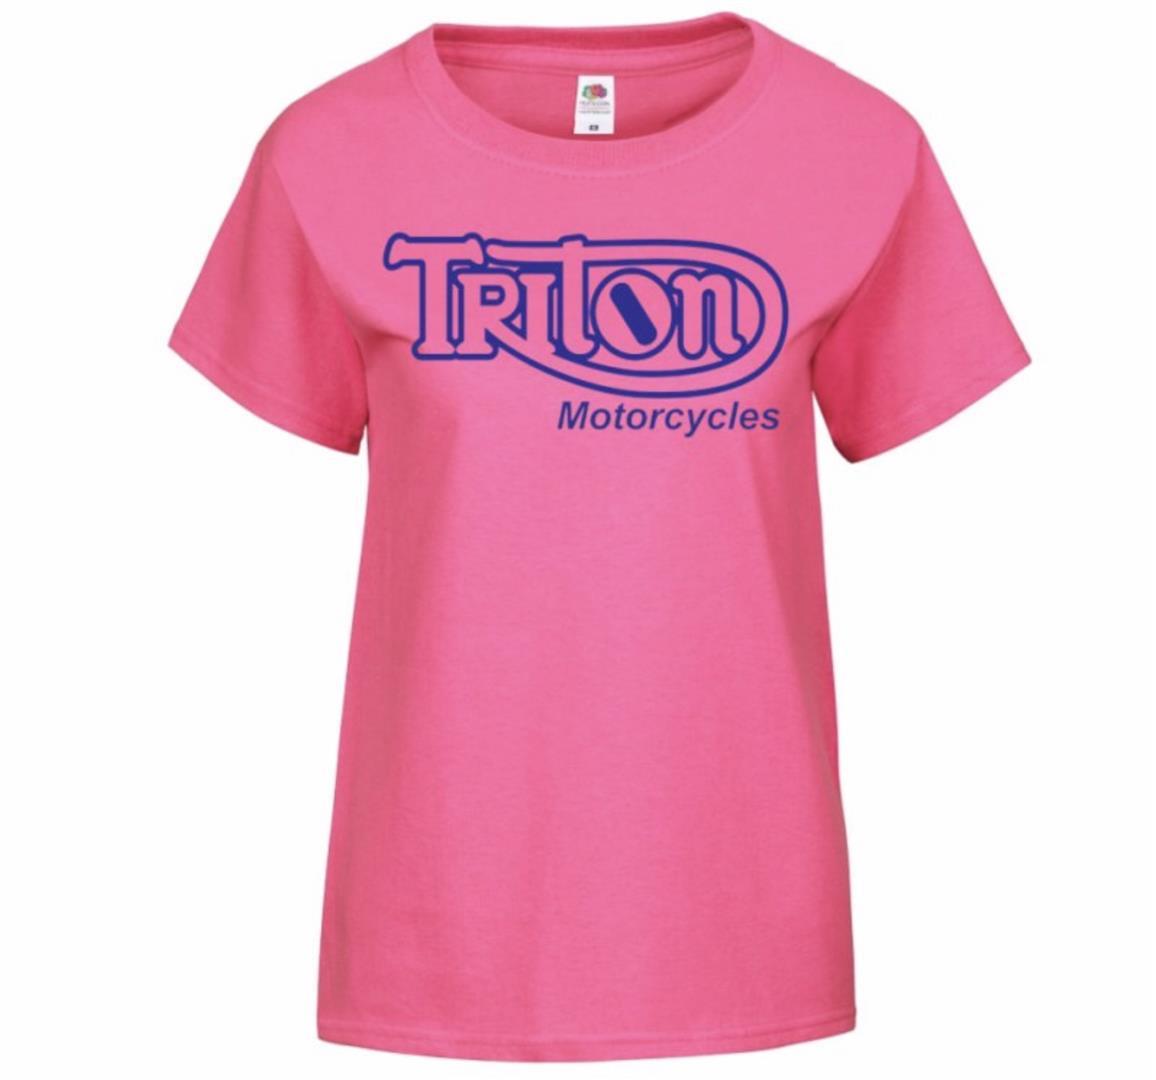 Women's (Pink) Triton T-Shirt